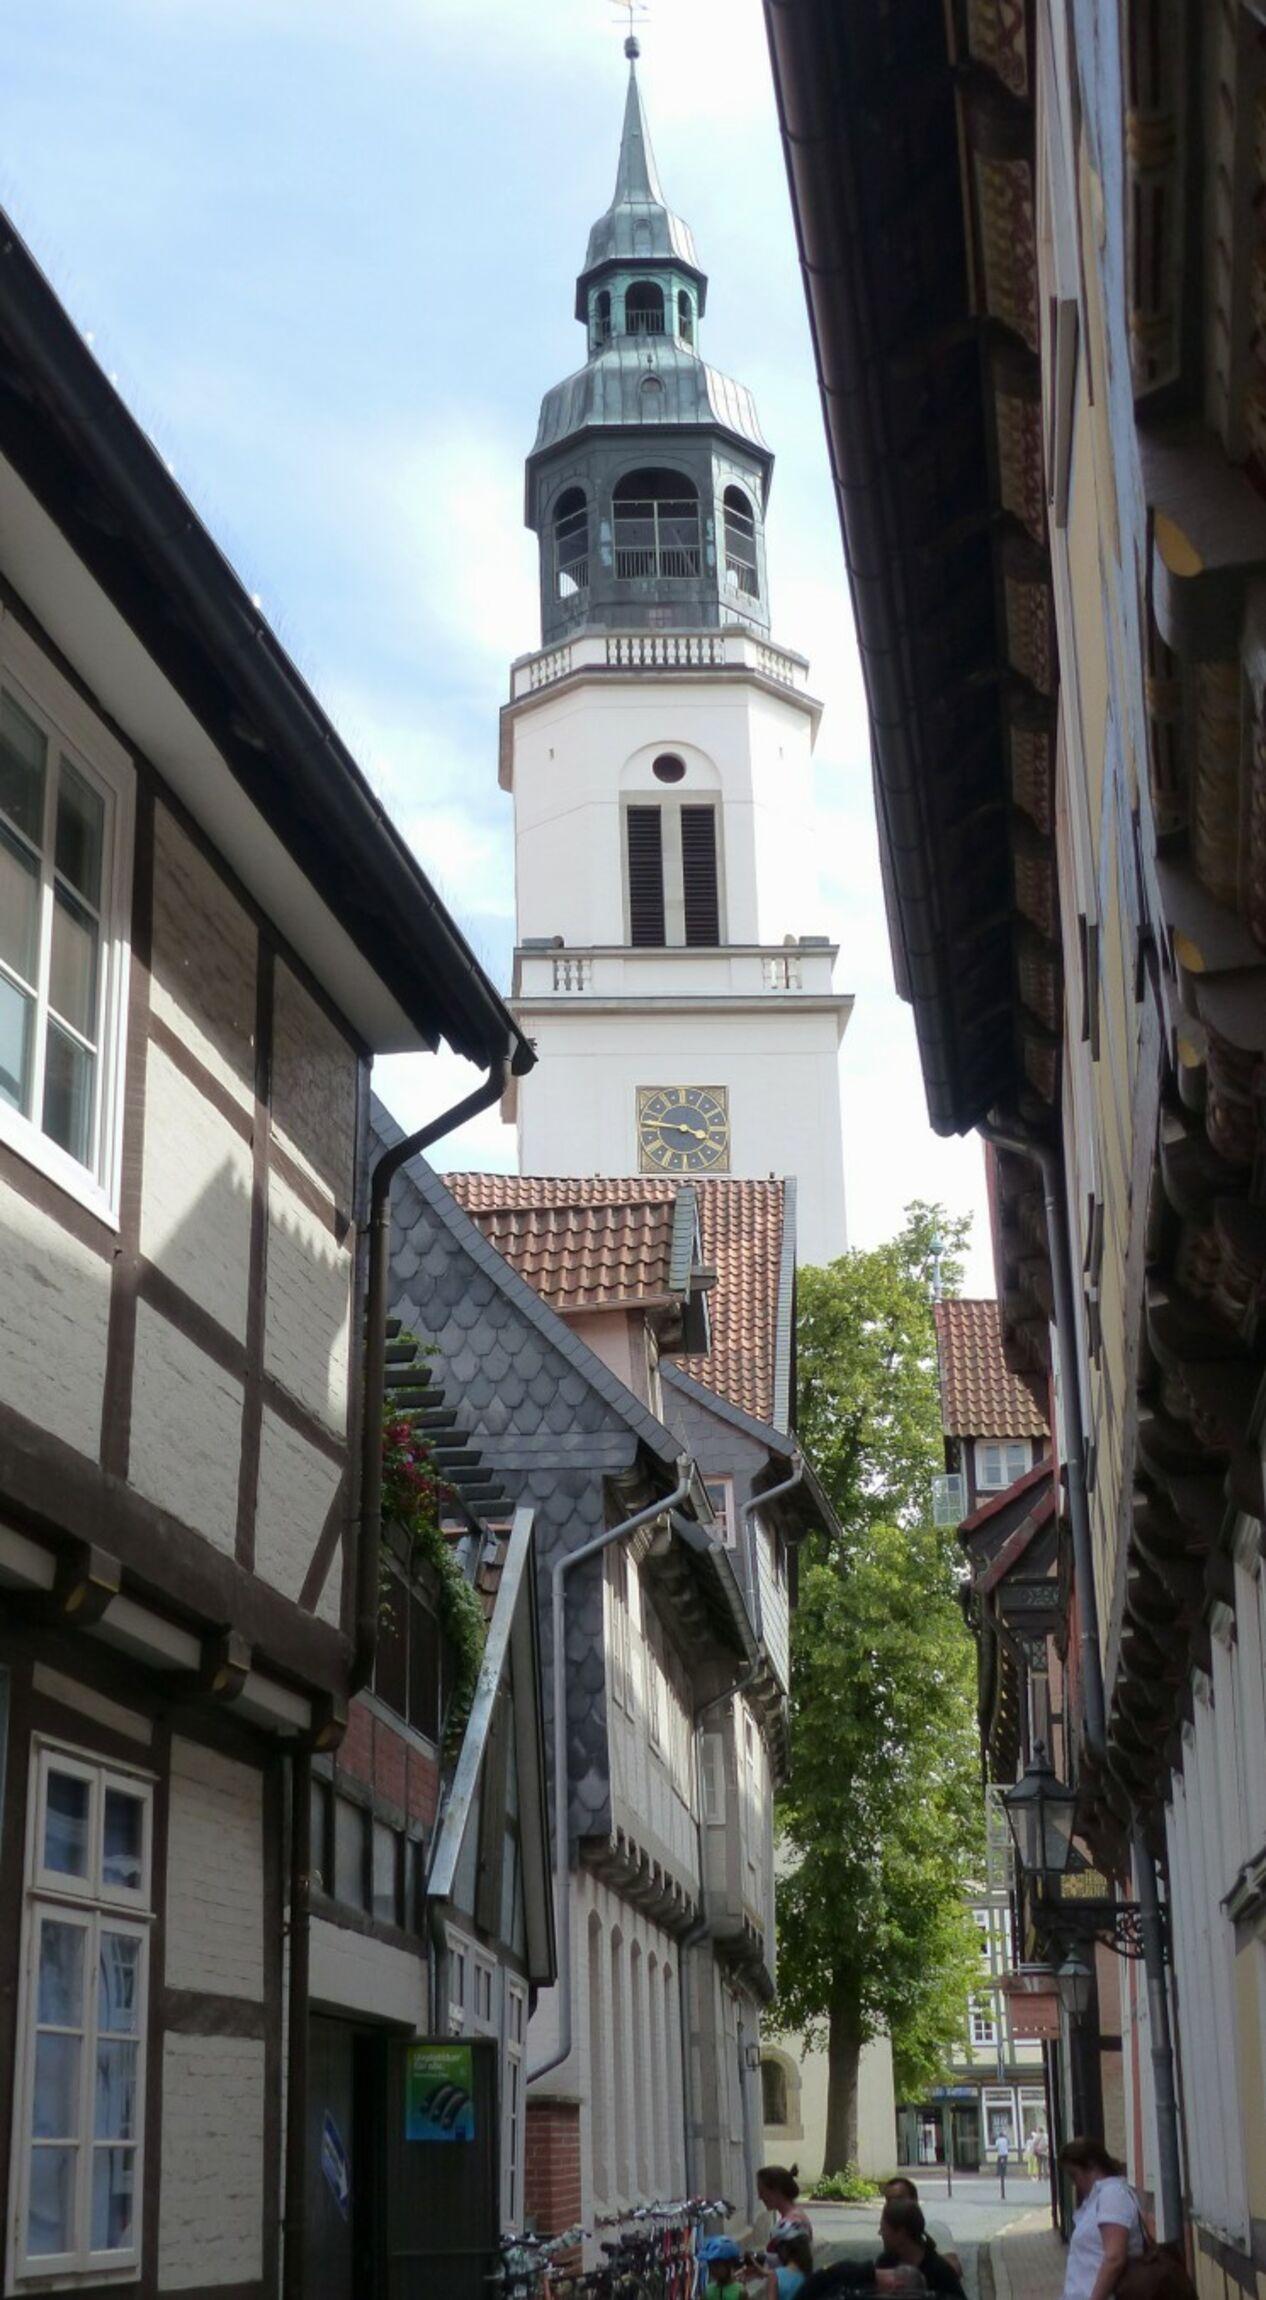 Turm von Kalandgasse